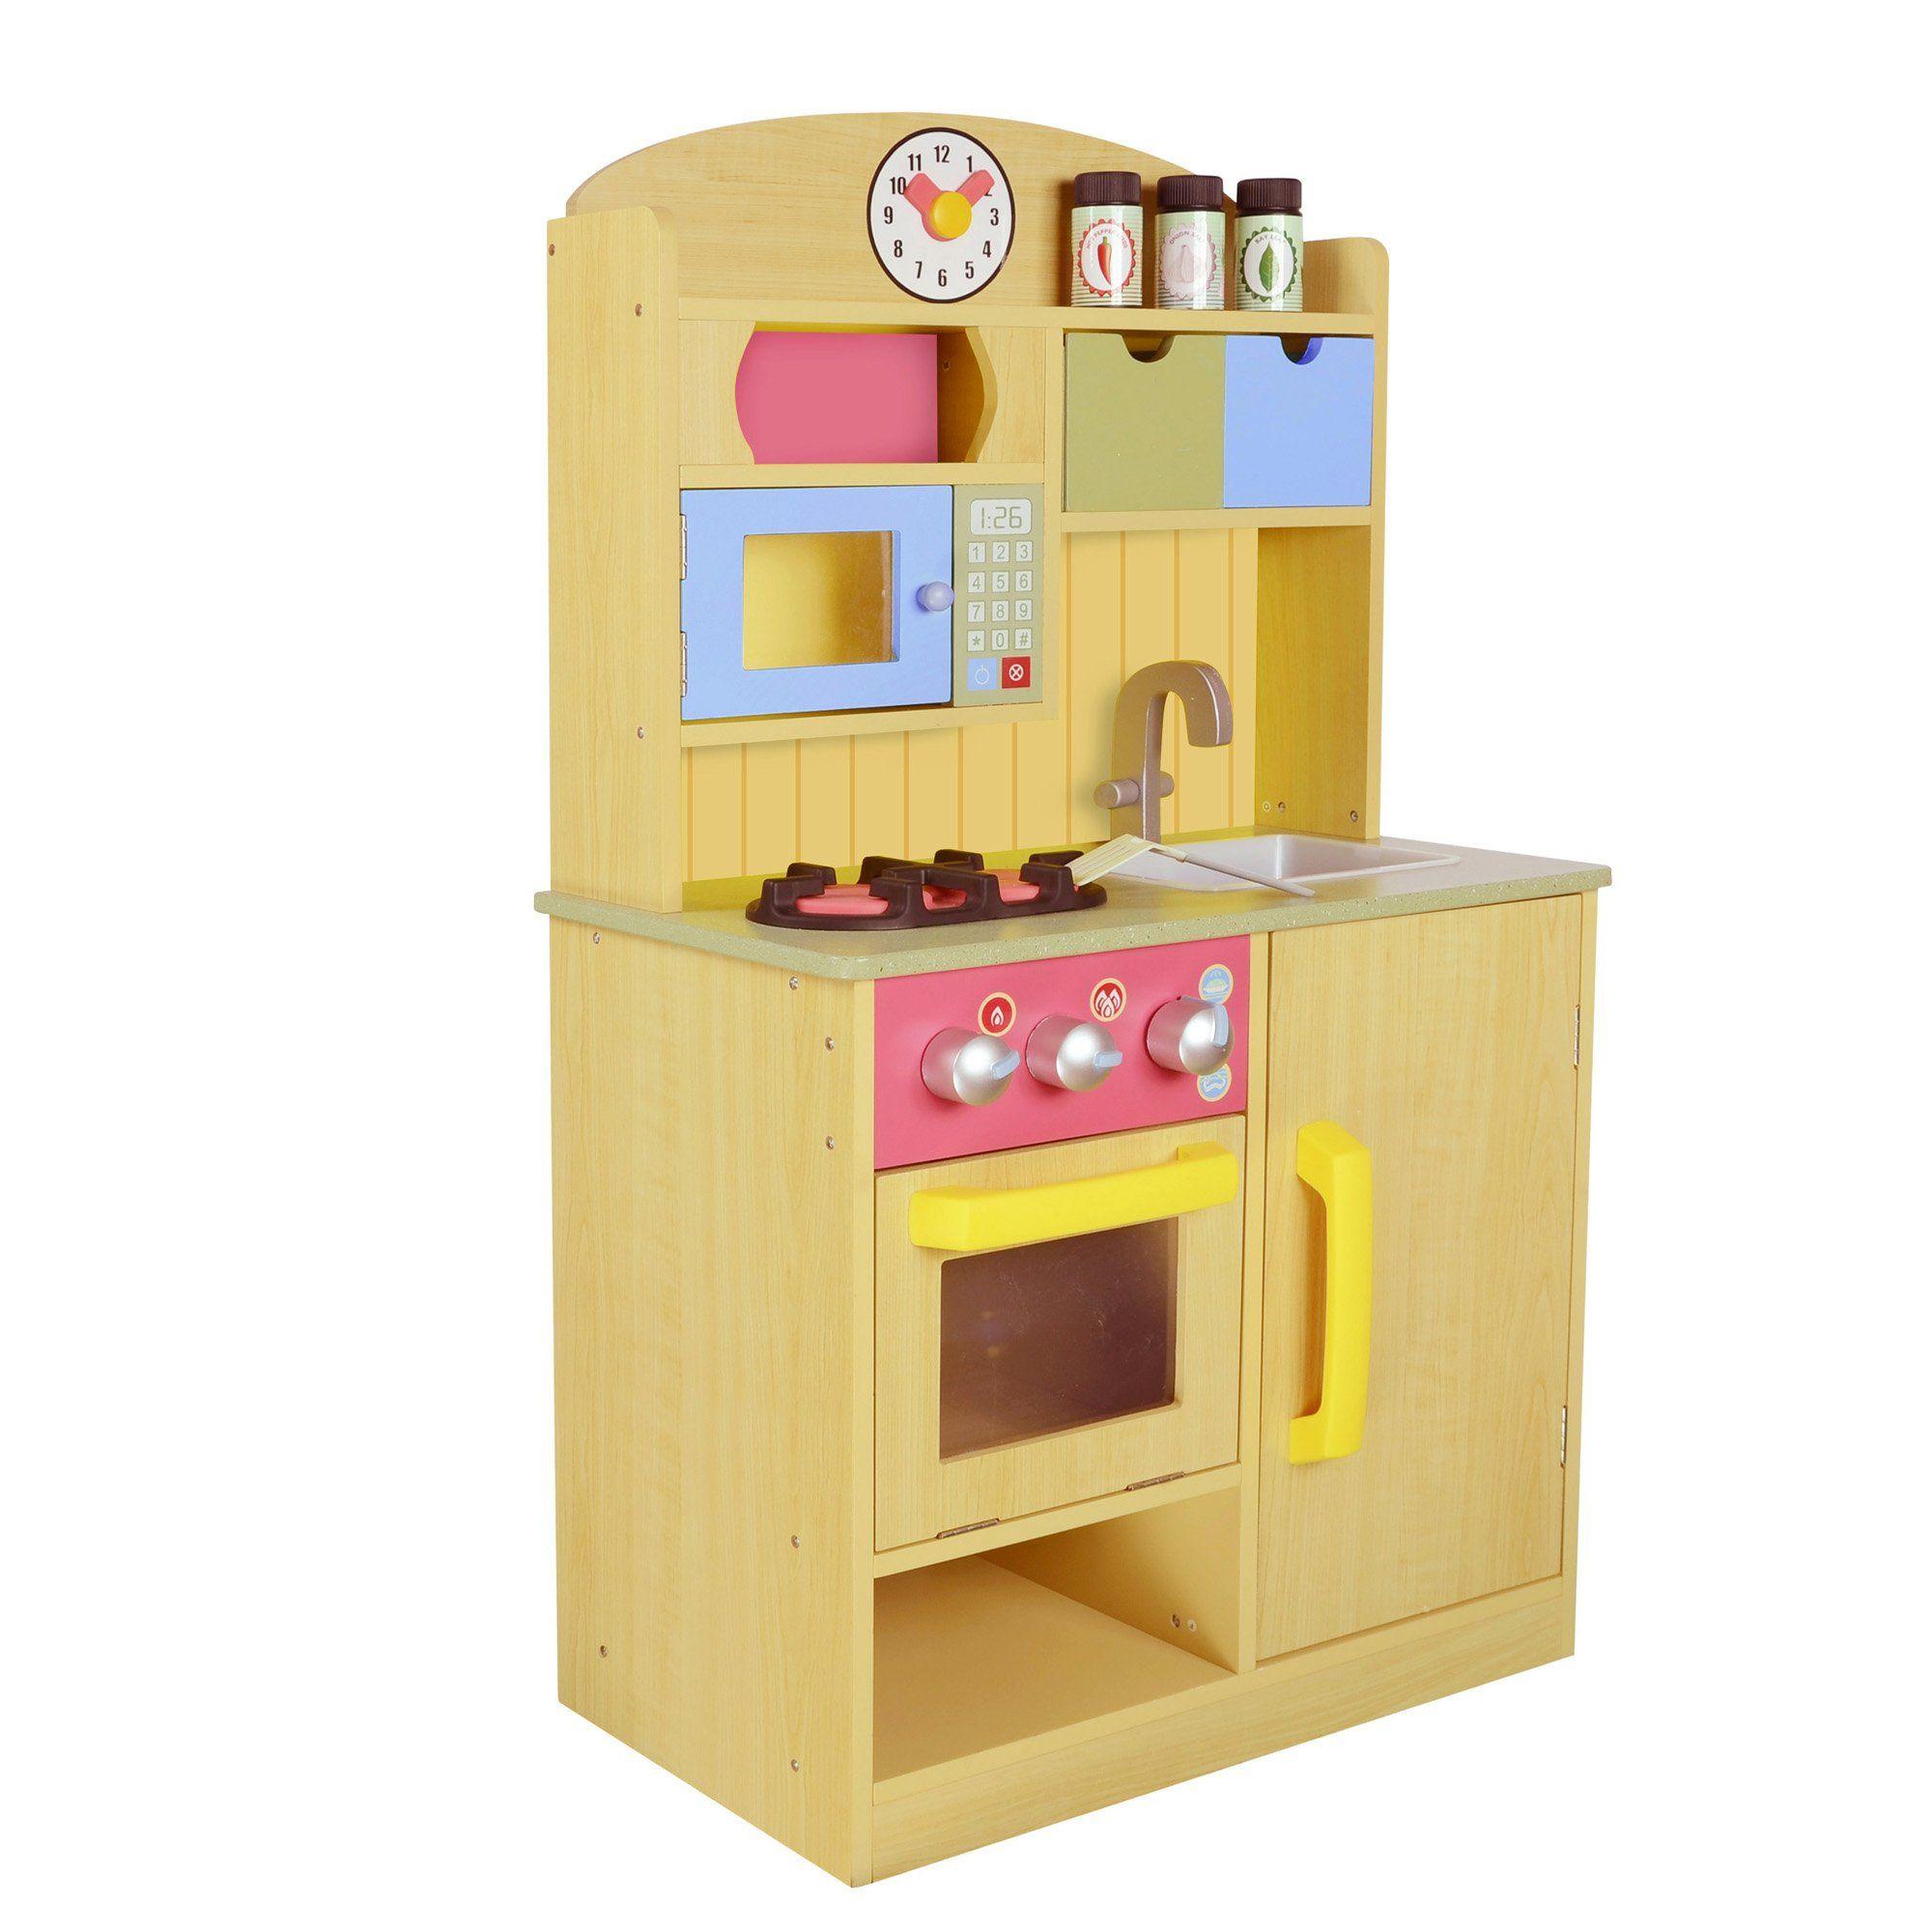 Kids Wood Kitchen Walmart Aid Mixer Teamson Little Chef Burlywood With Accessories